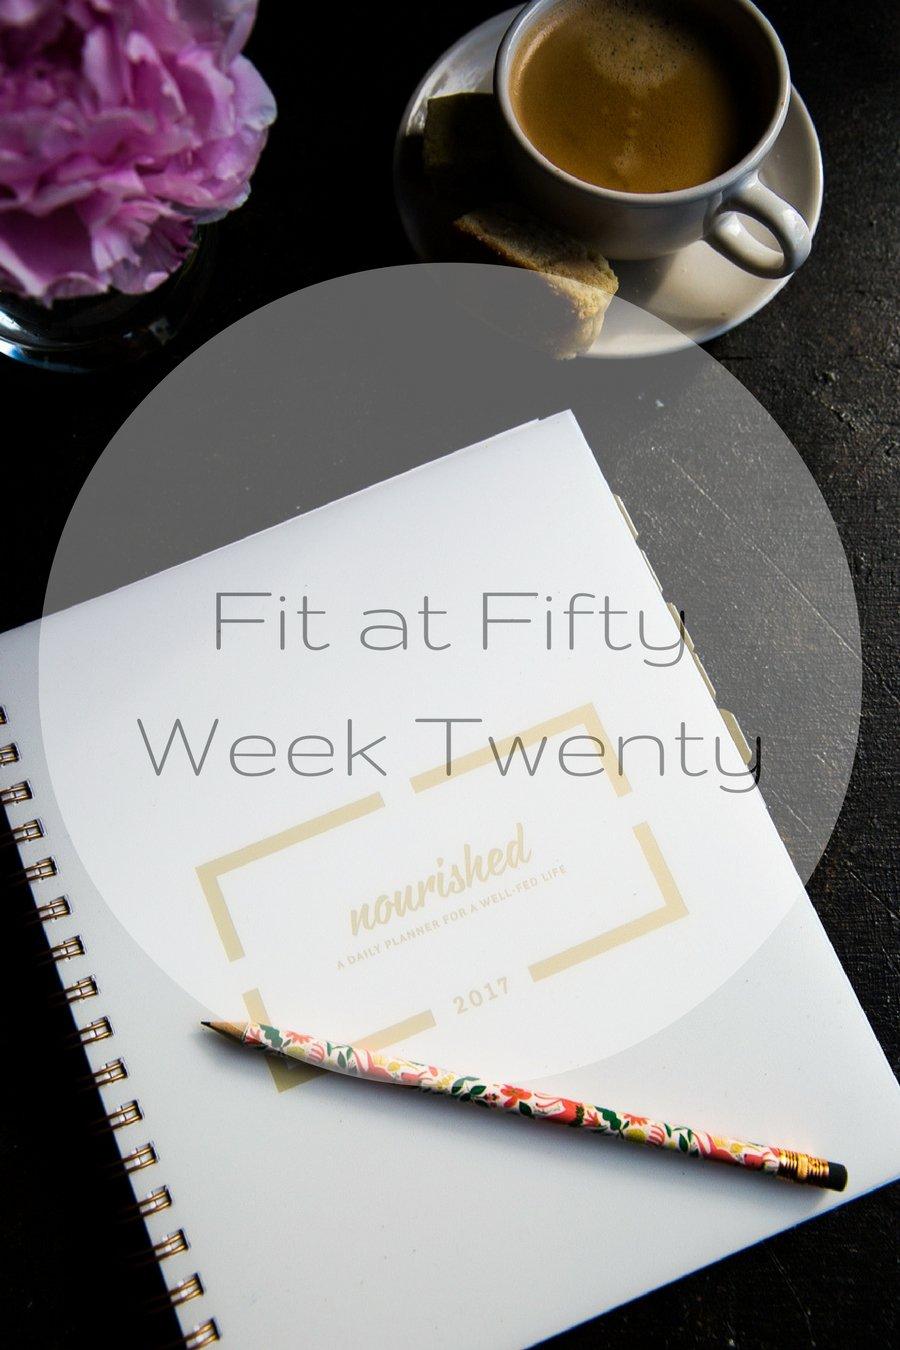 Fit at Fifty Week Twenty